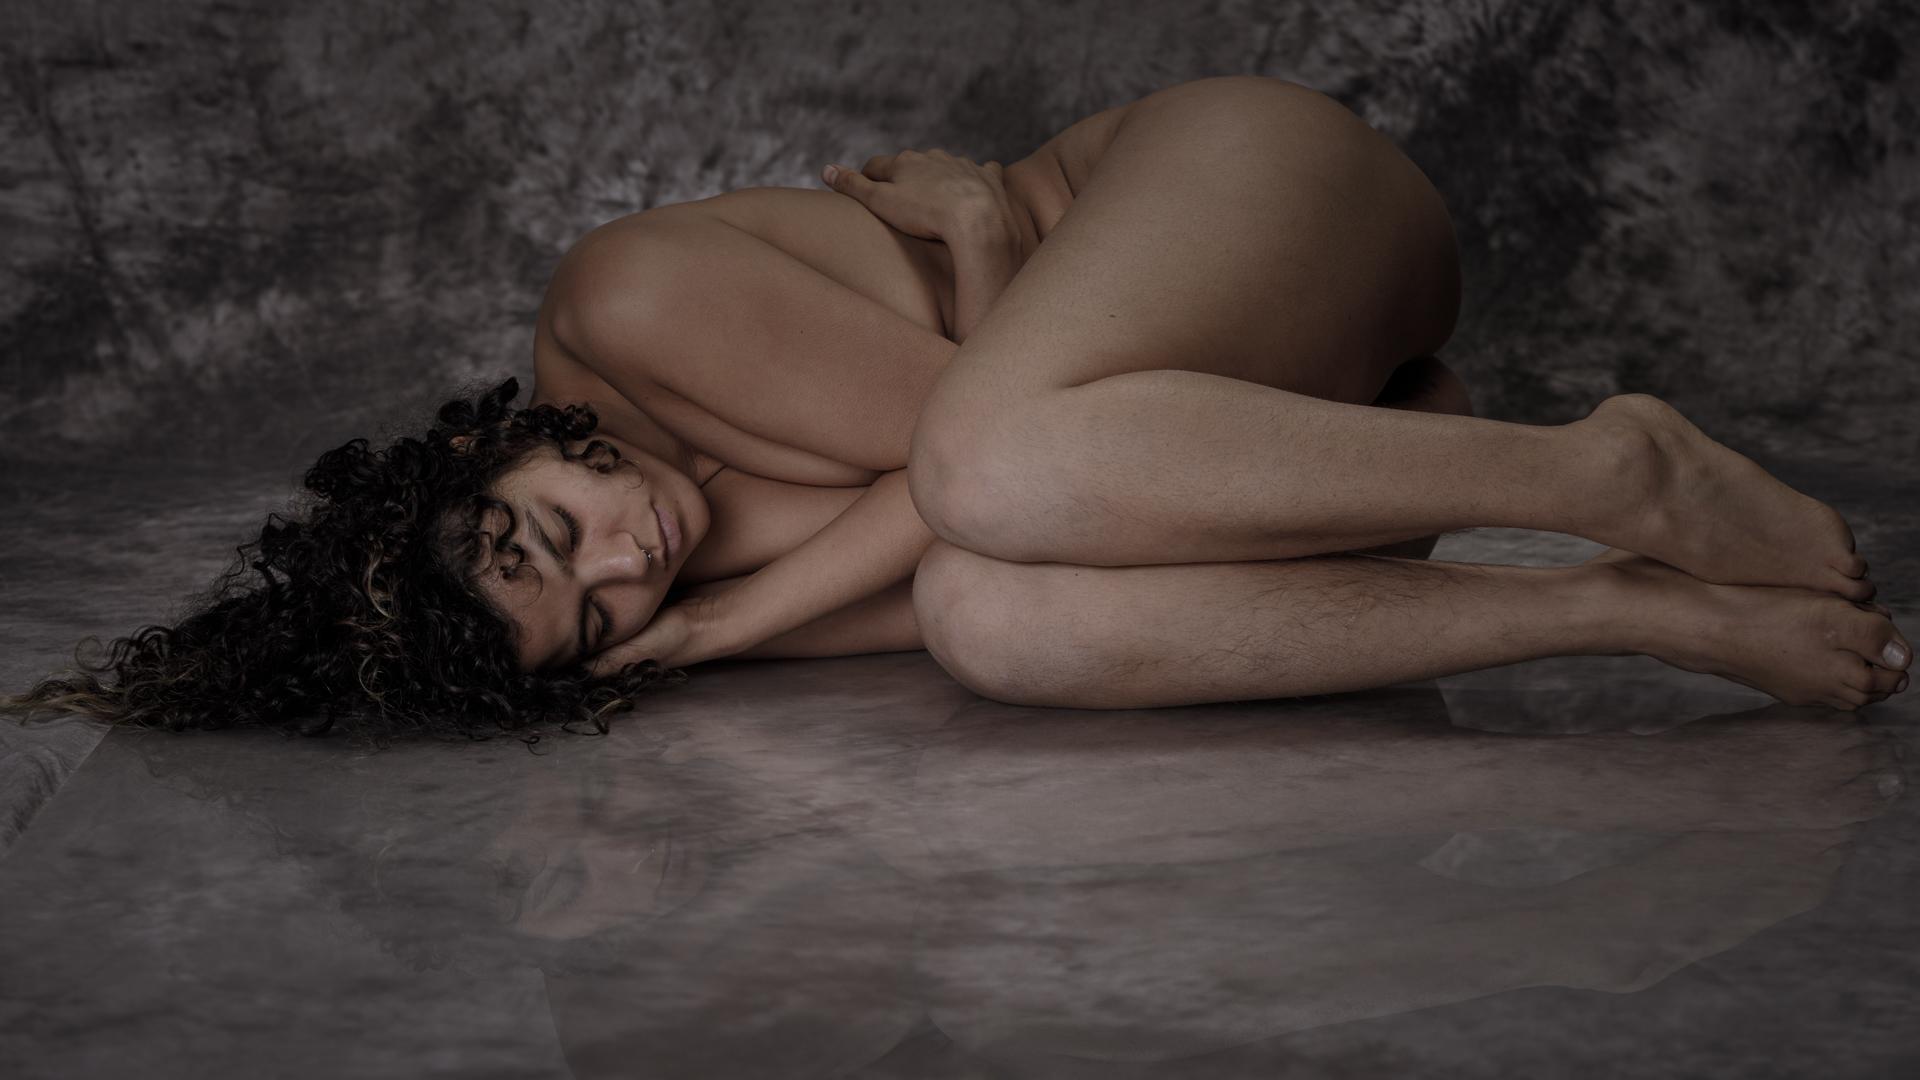 CFrenette-Miss-Abiblue-21